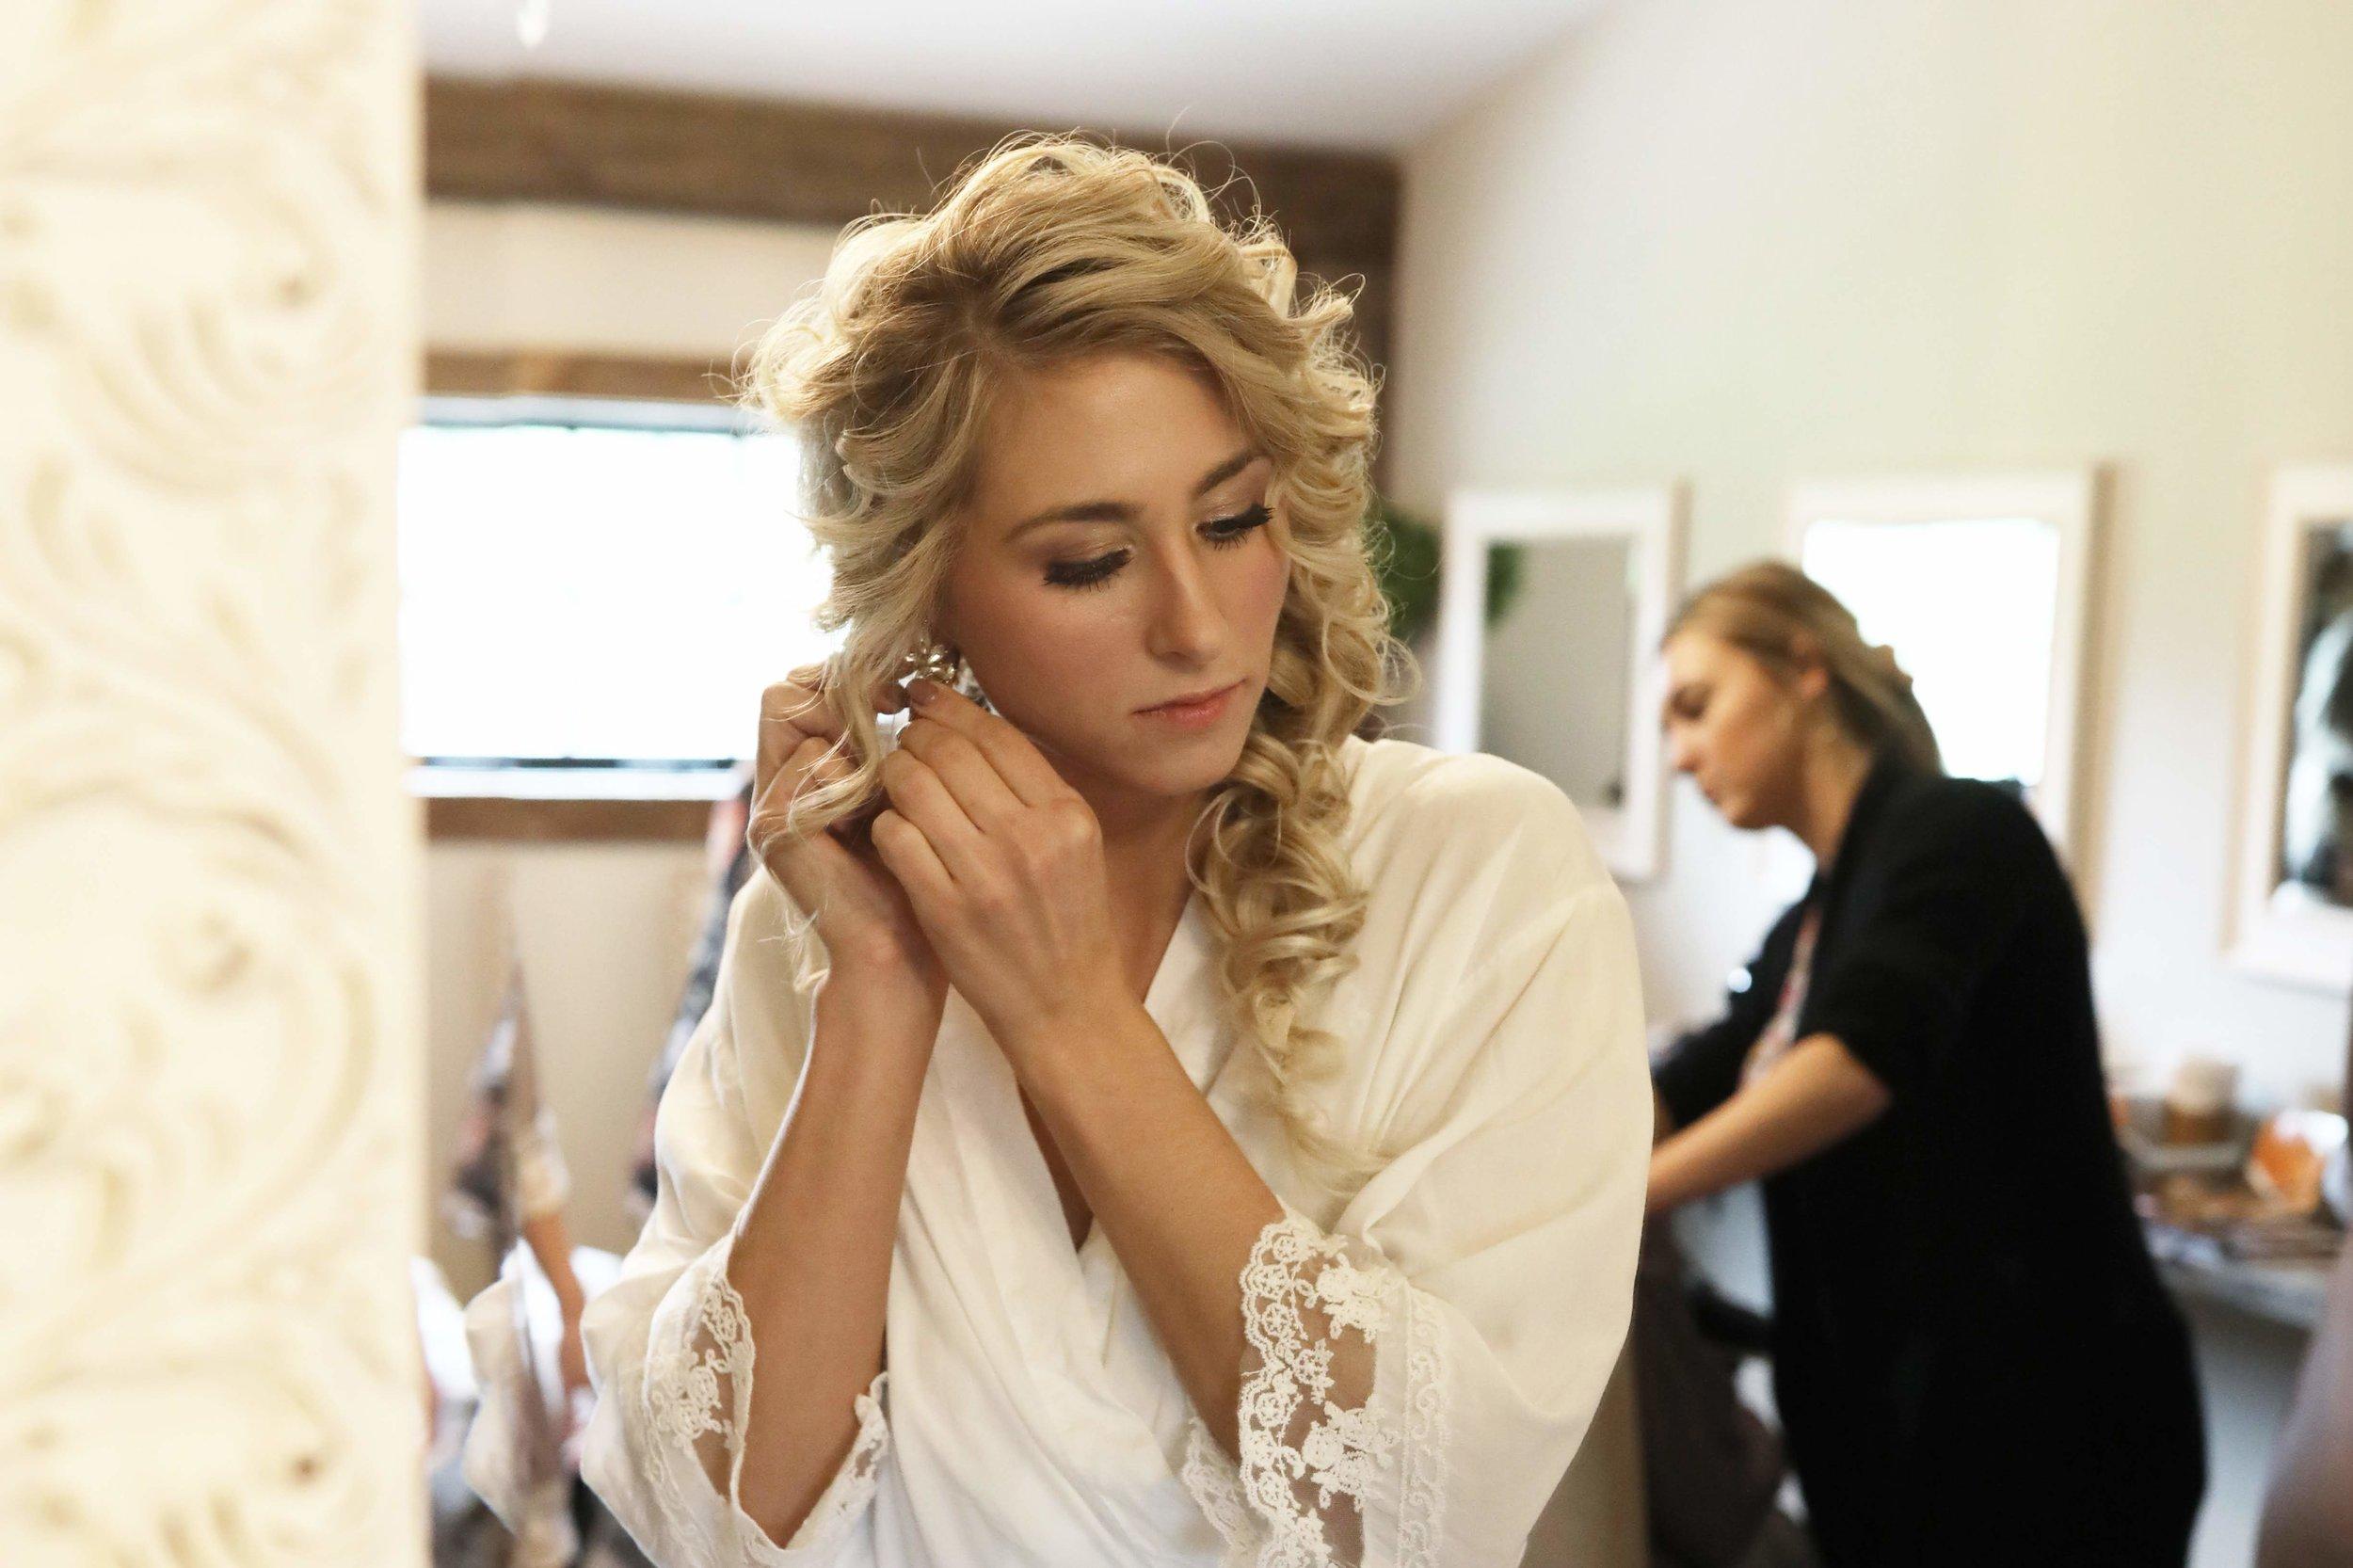 The beautiful bride, Stephanie!